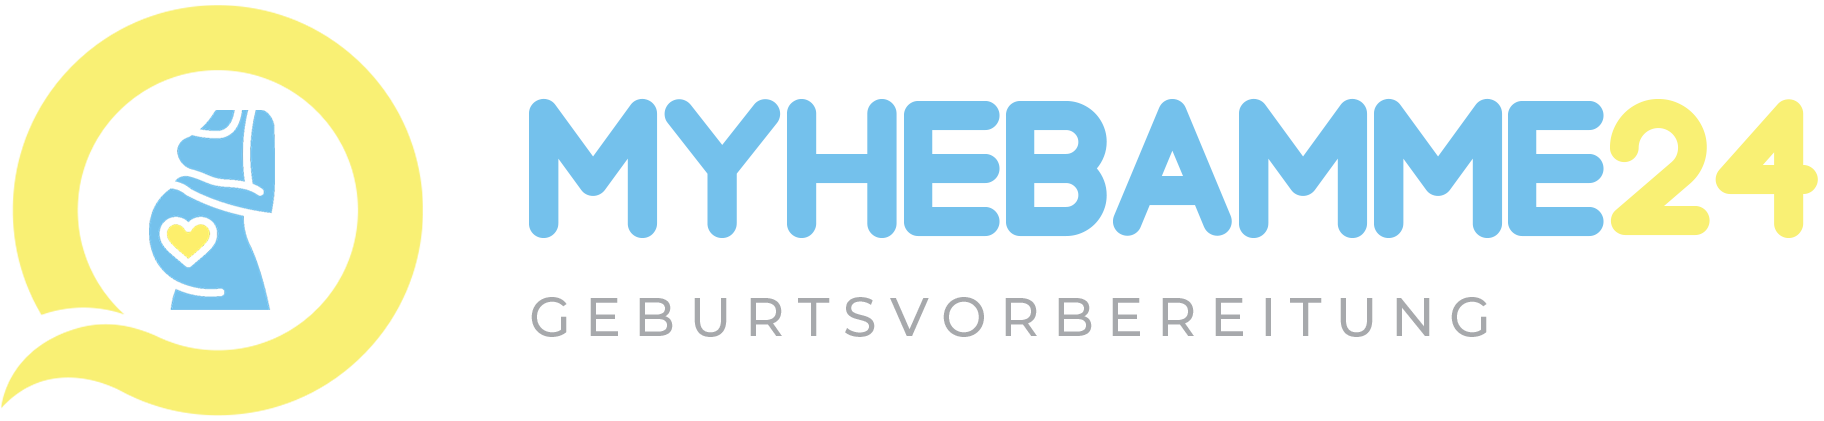 MyHebamme24 Geburtsvorbereitung